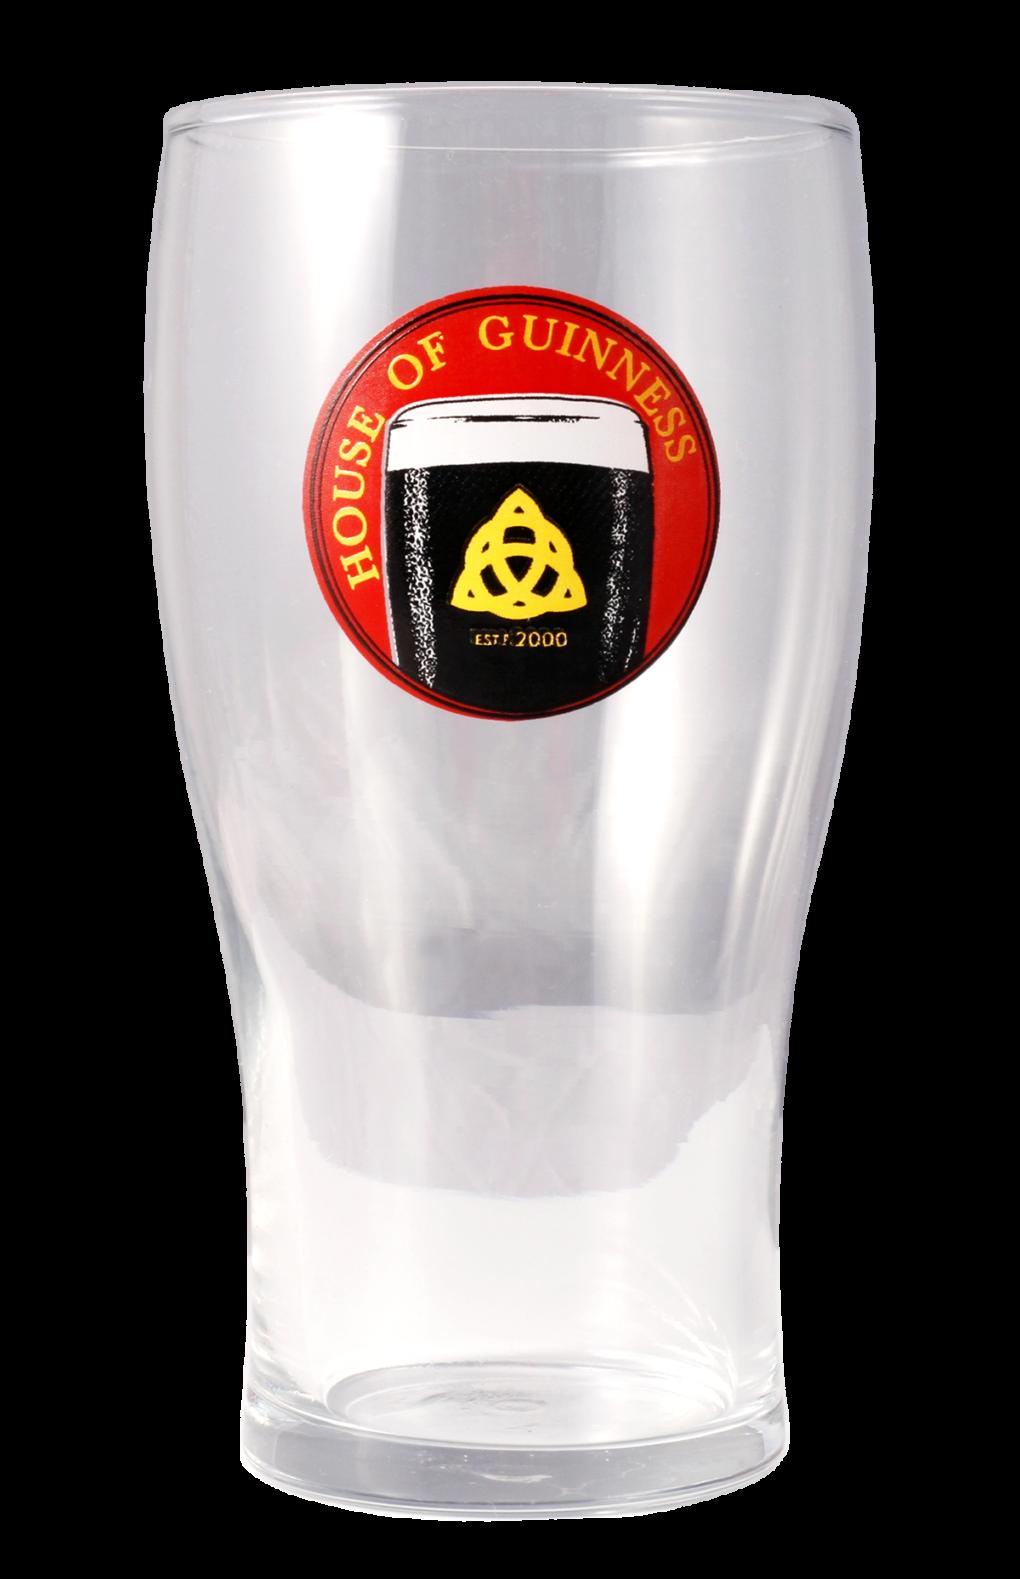 House of Guinness Pint Glass